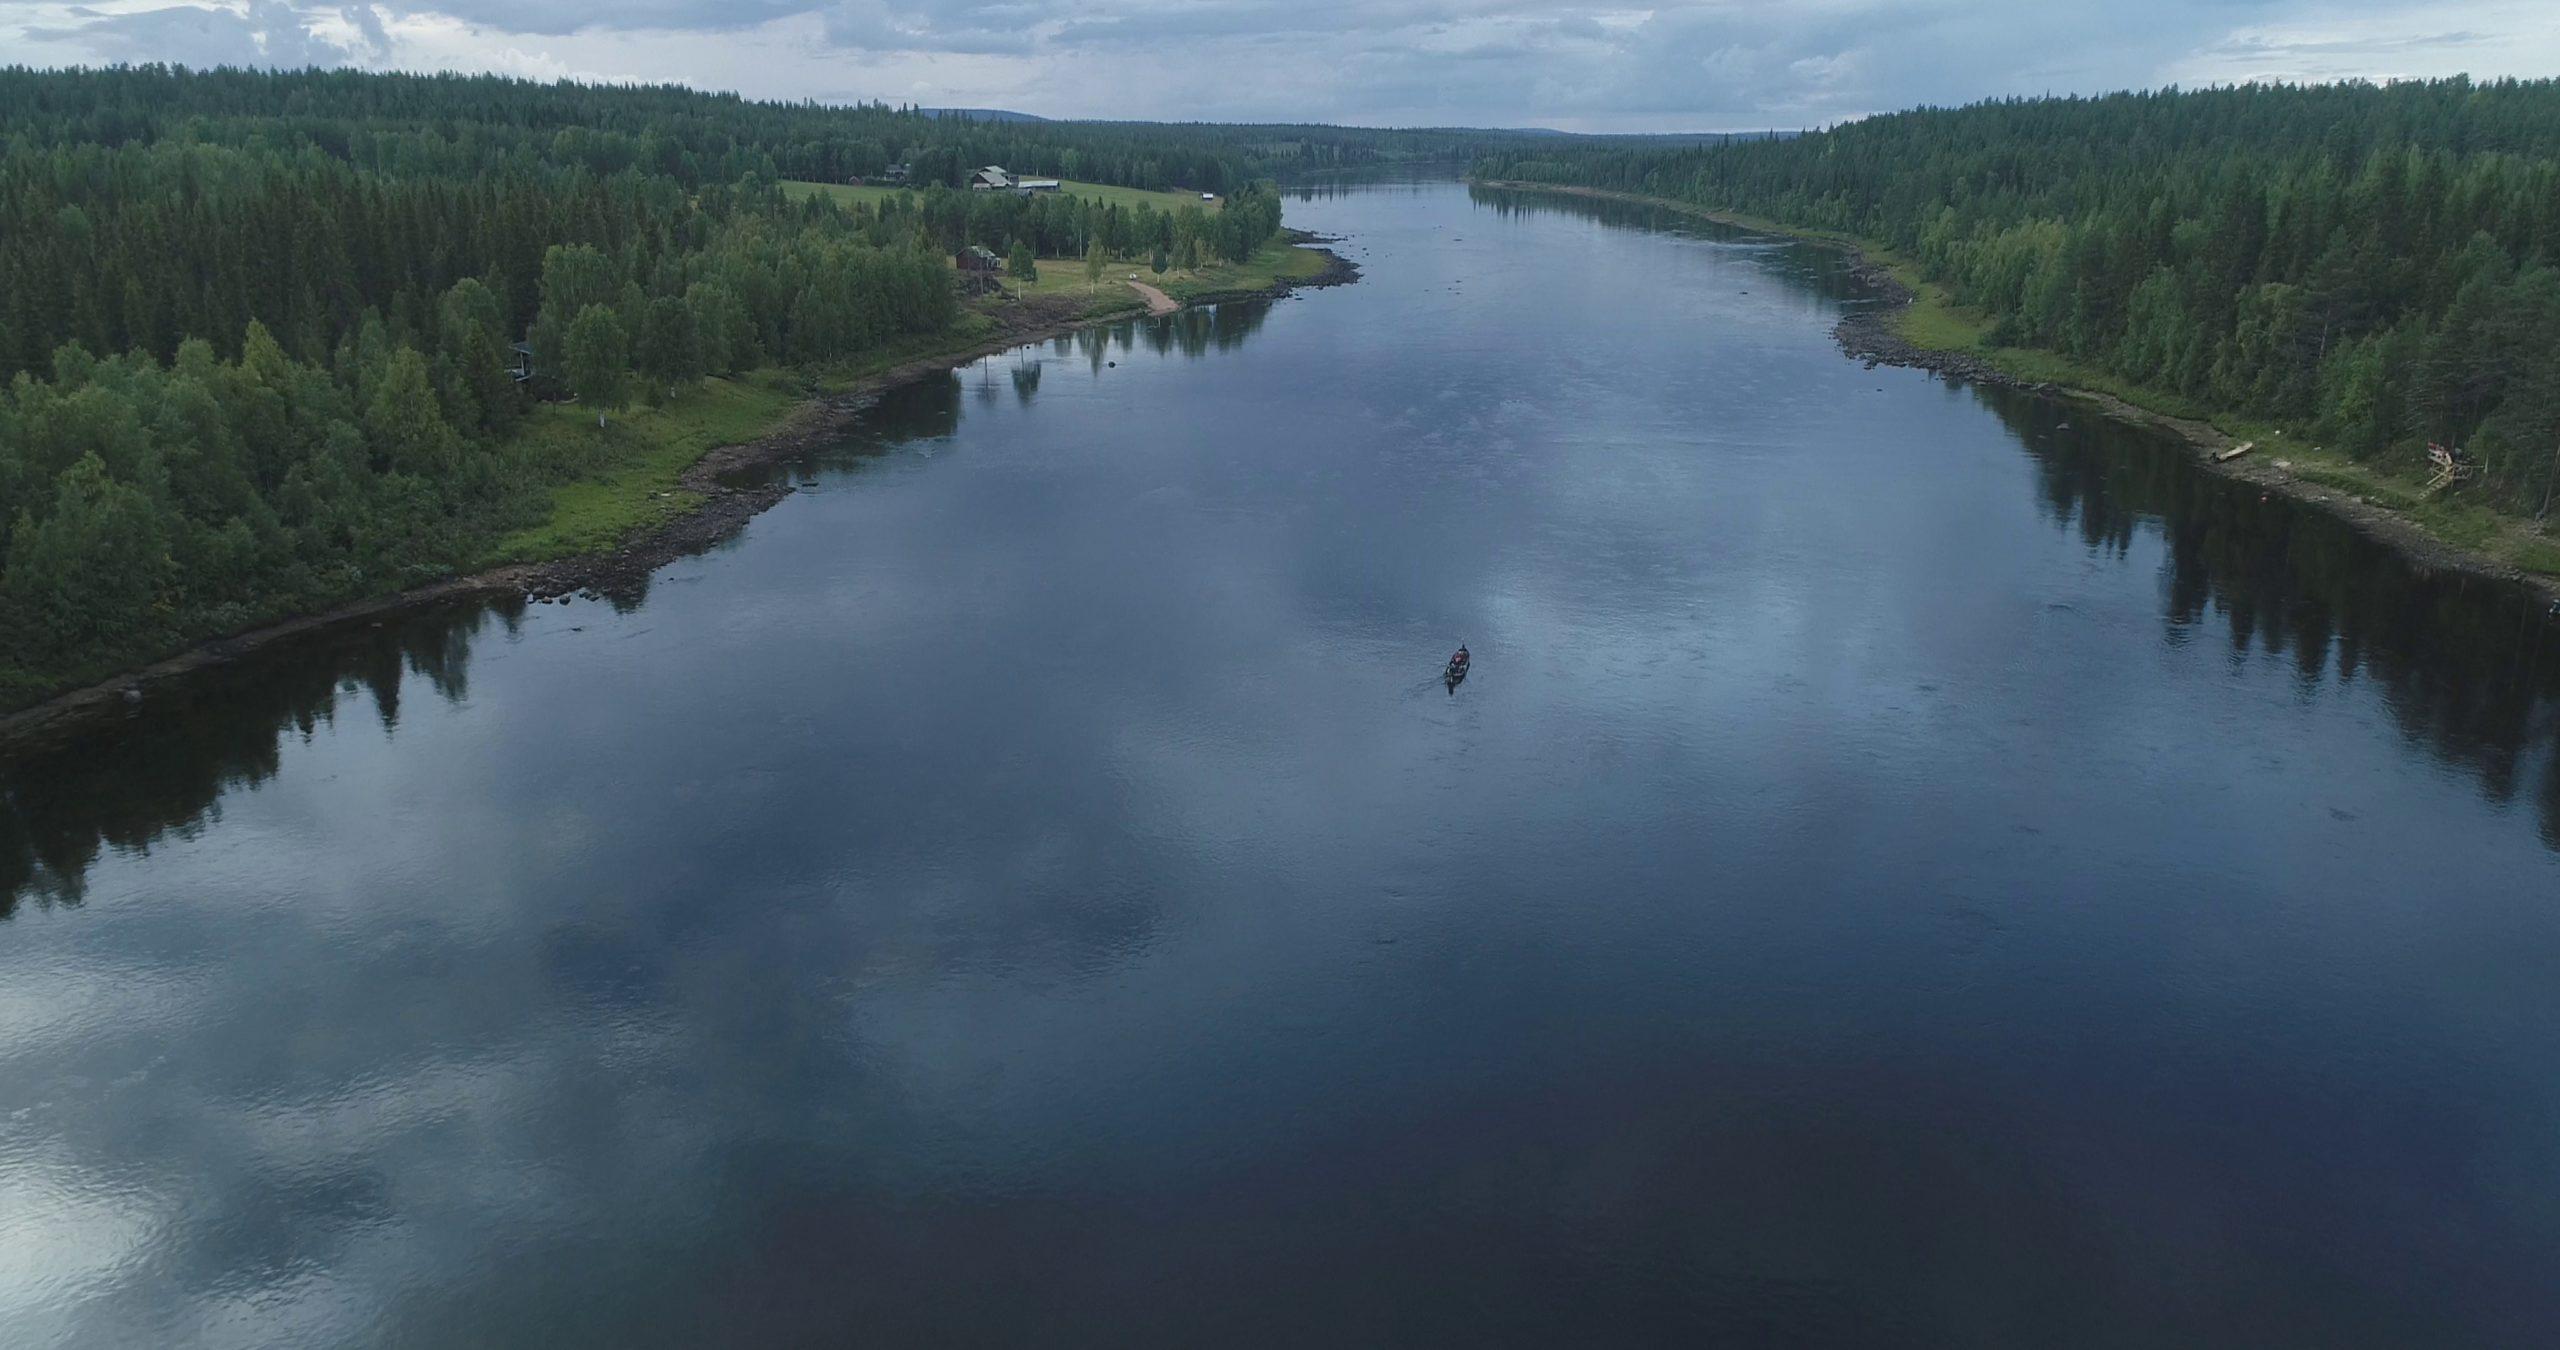 Kuusisuvanto, home of 40lb salmons